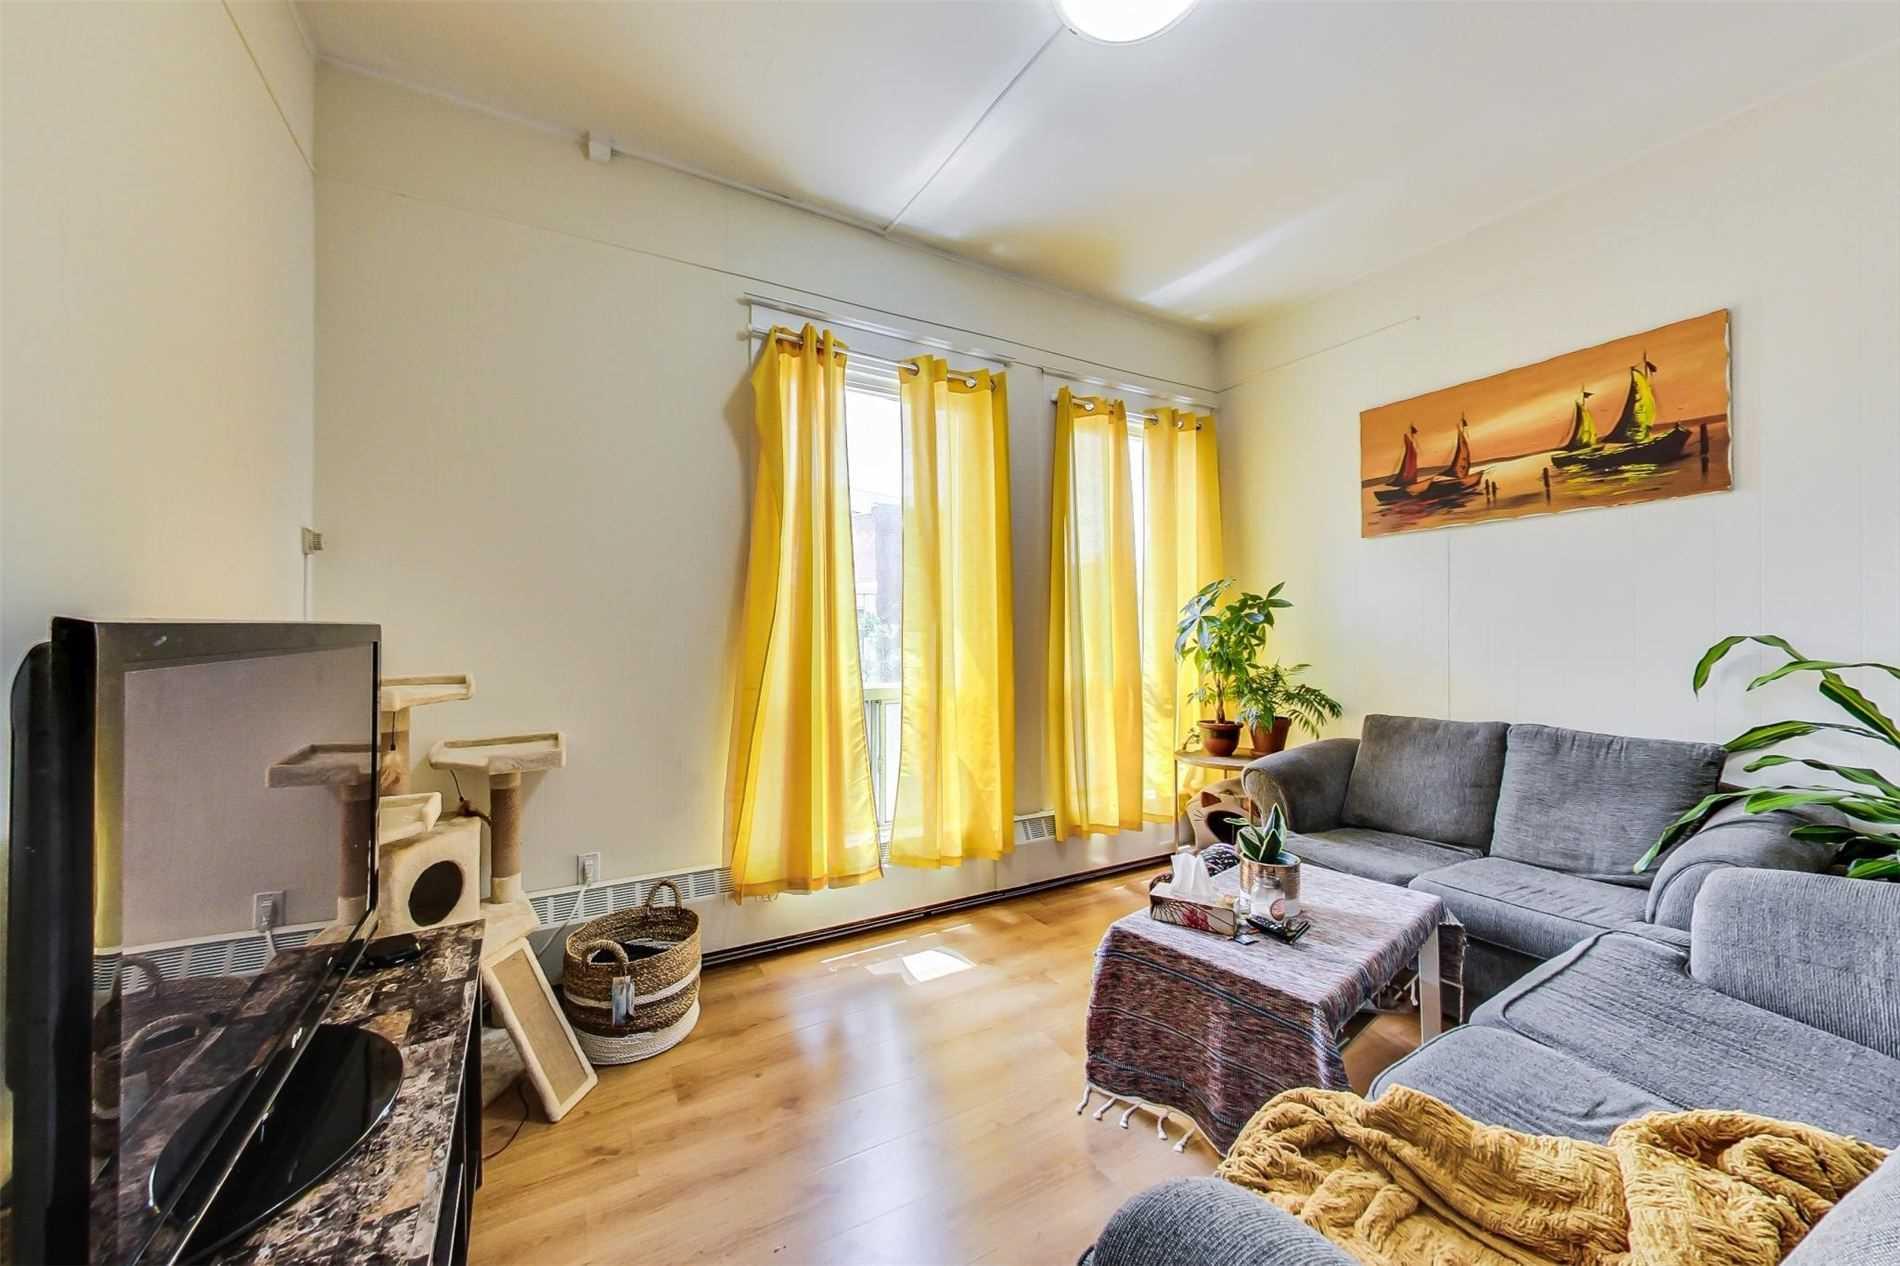 2978-88 Dundas St, Toronto, Ontario M6P1Z3, 9 Bedrooms Bedrooms, 24 Rooms Rooms,16 BathroomsBathrooms,Store W/apt/offc,For Sale,Dundas,W5311590